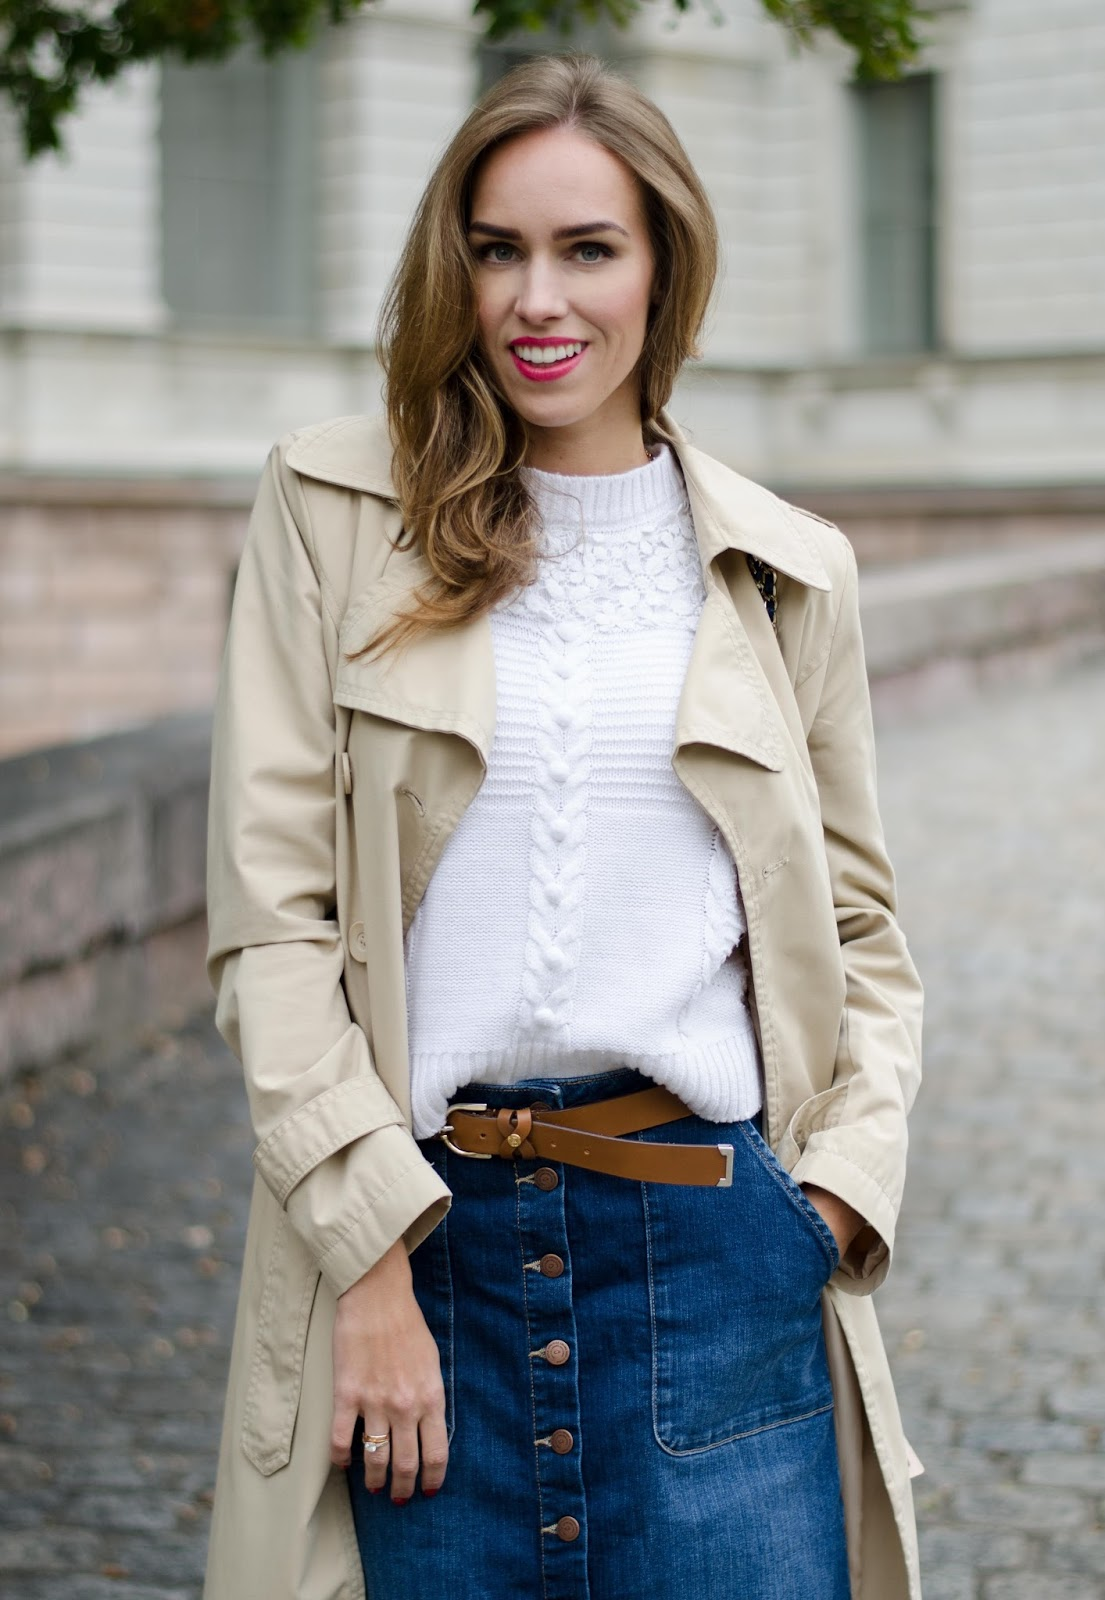 kristjaana mere beige trench white sweater blue denim skirt brown belt outfit